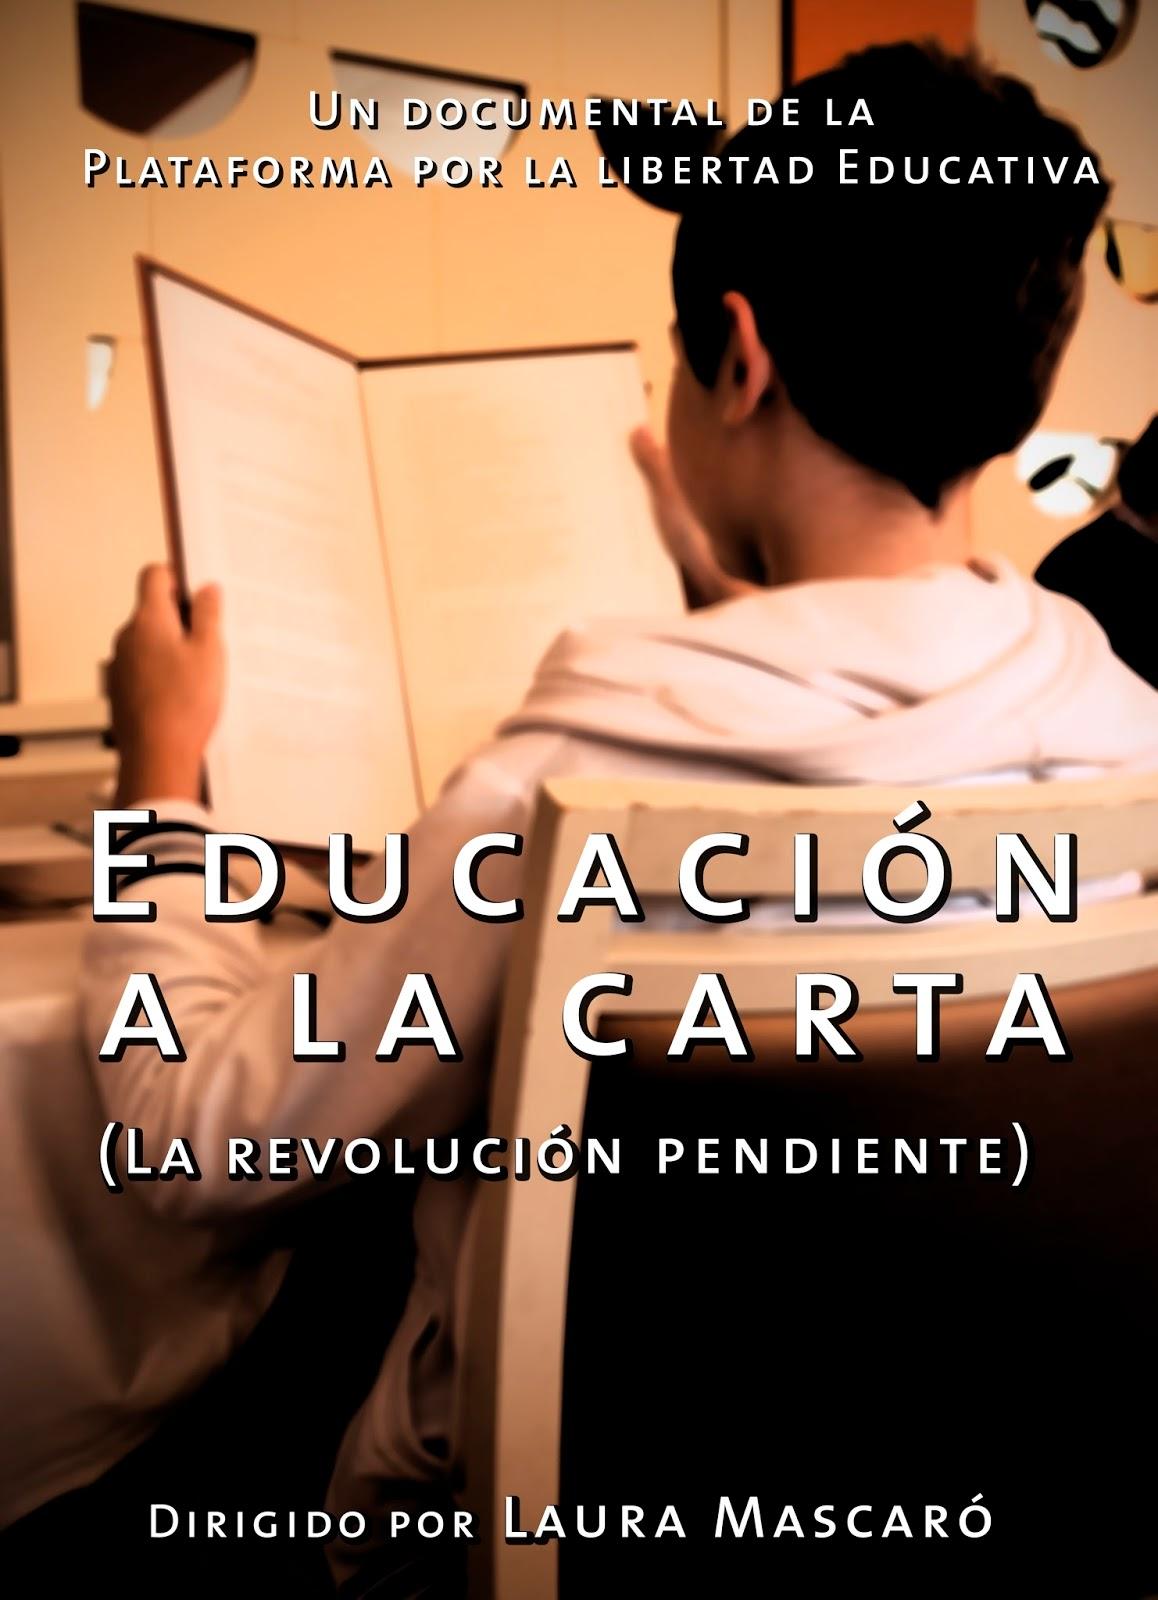 Documental sobre libertad educativa